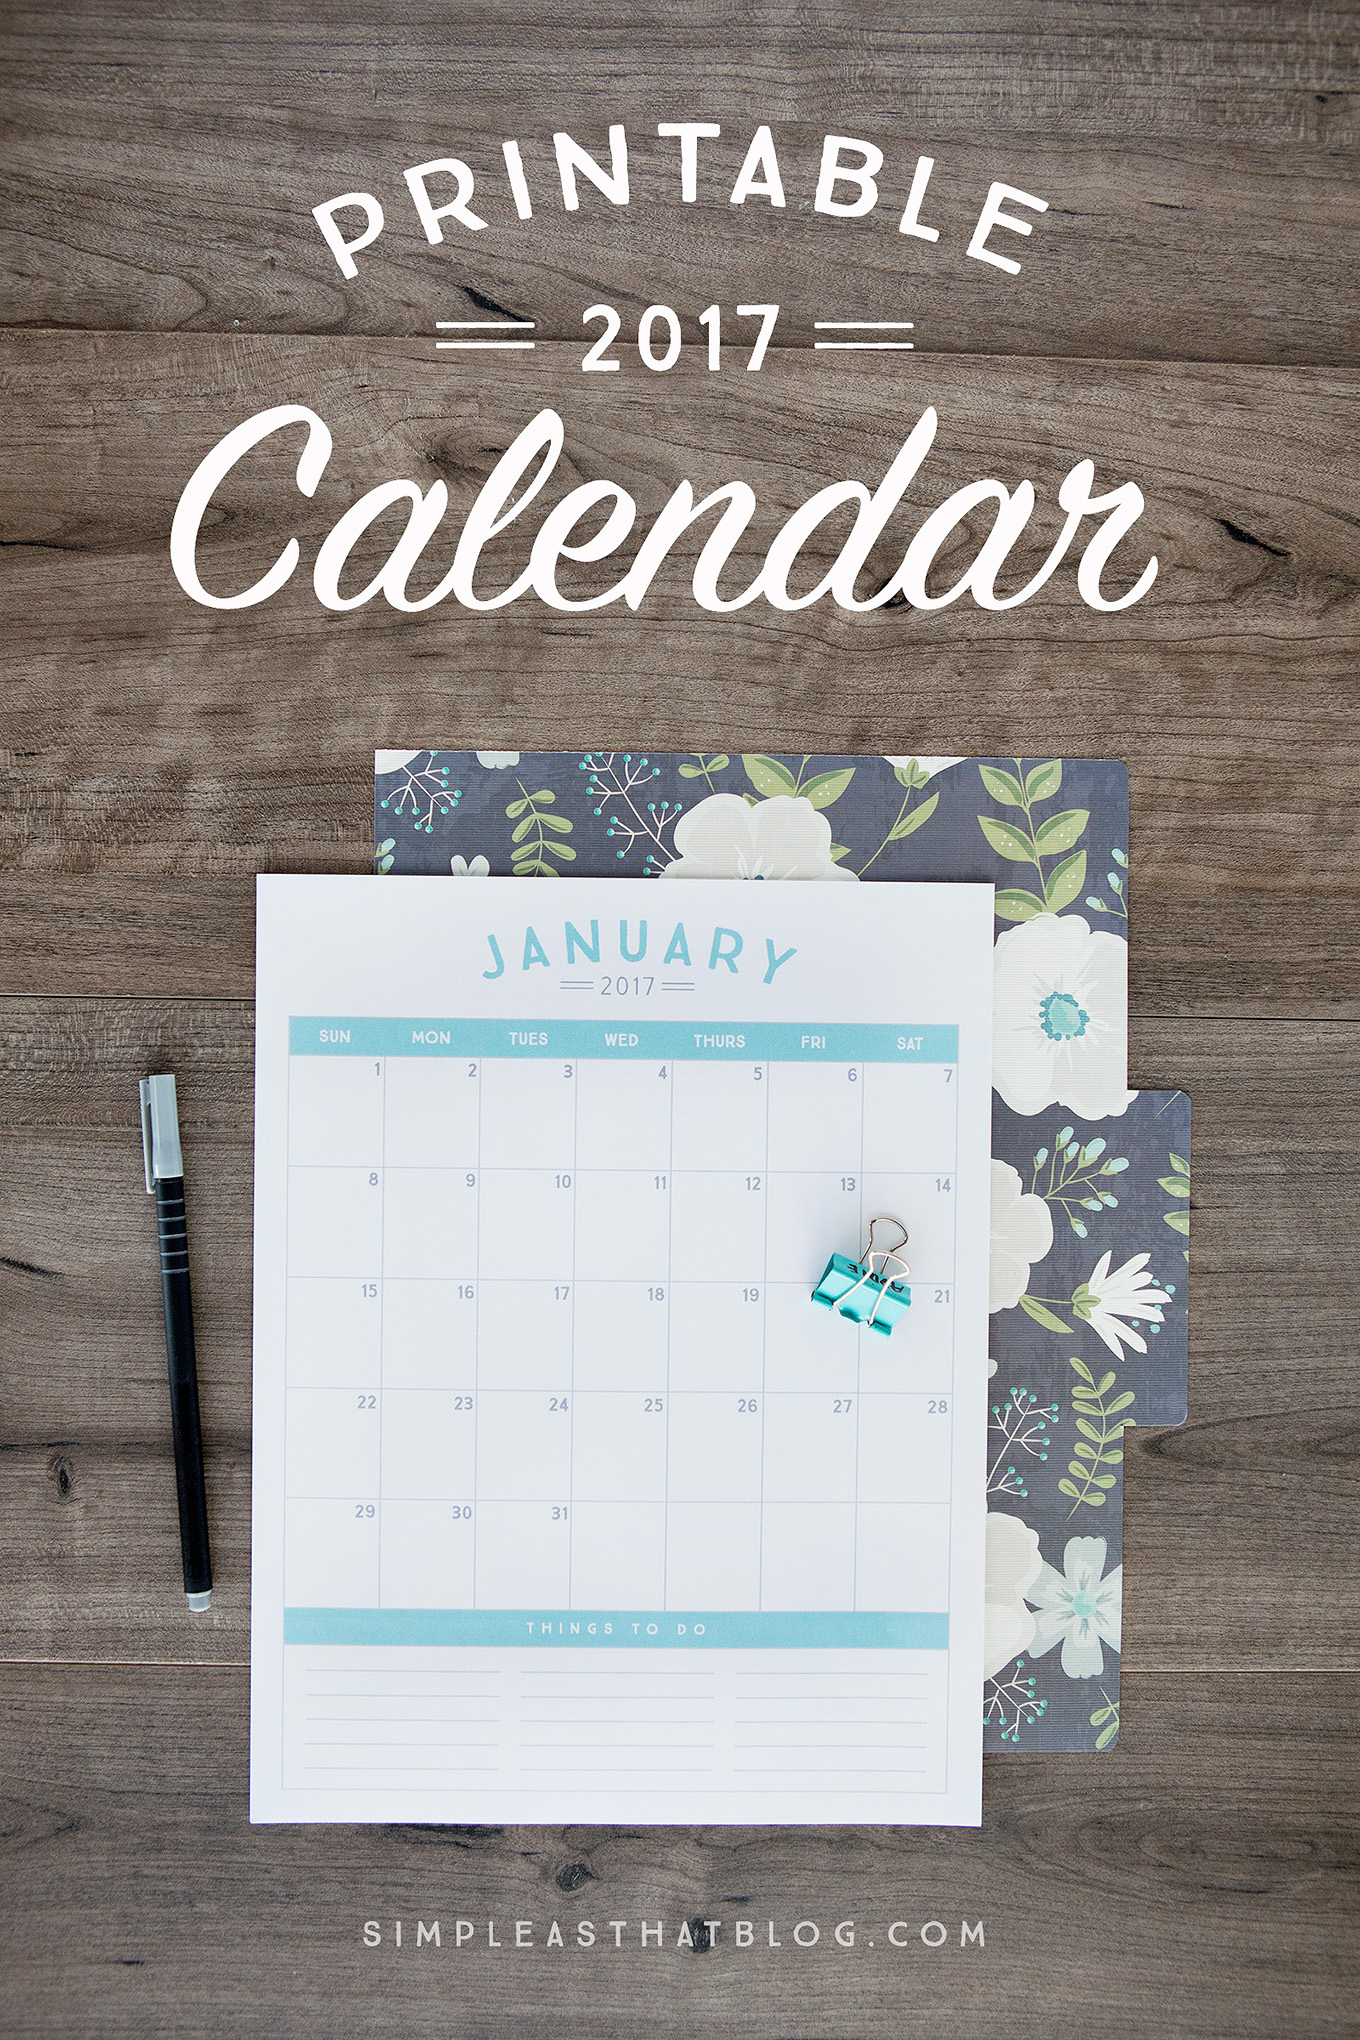 Free Printable 2017 Calendar - Free 2017 Printable